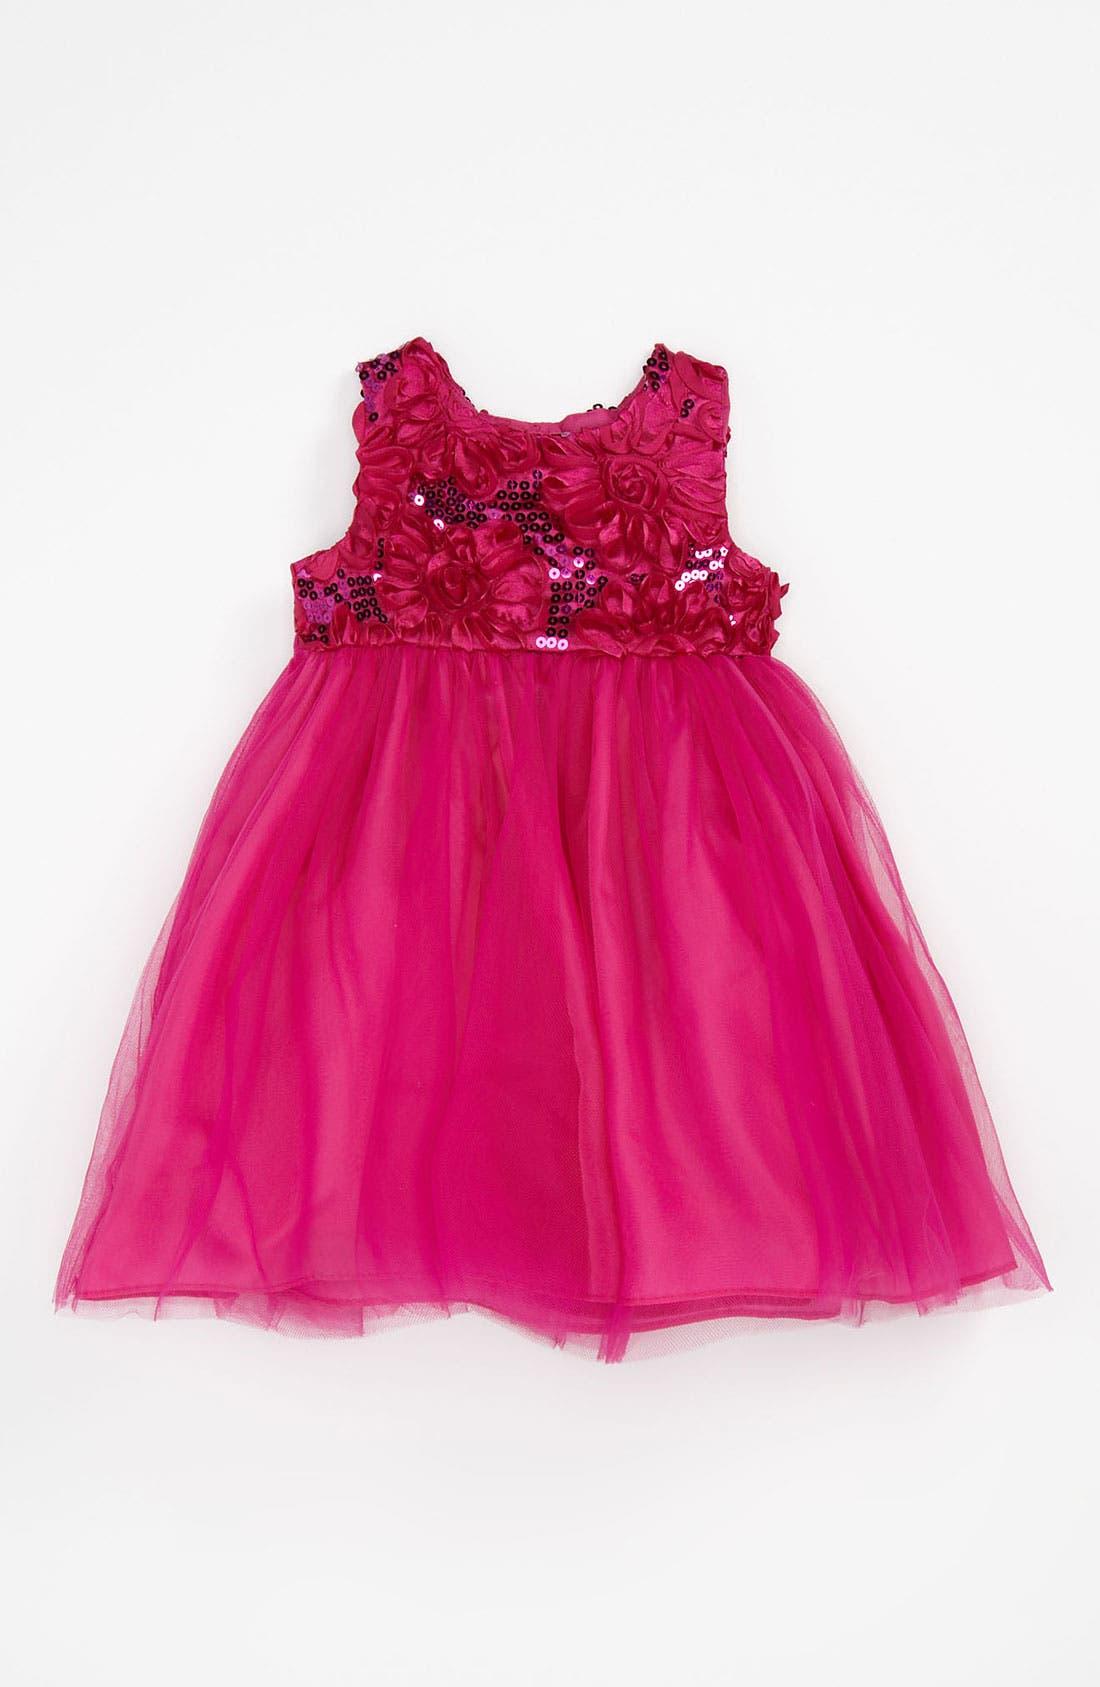 Main Image - Pippa & Julie Sequin Ballerina Dress (Toddler)